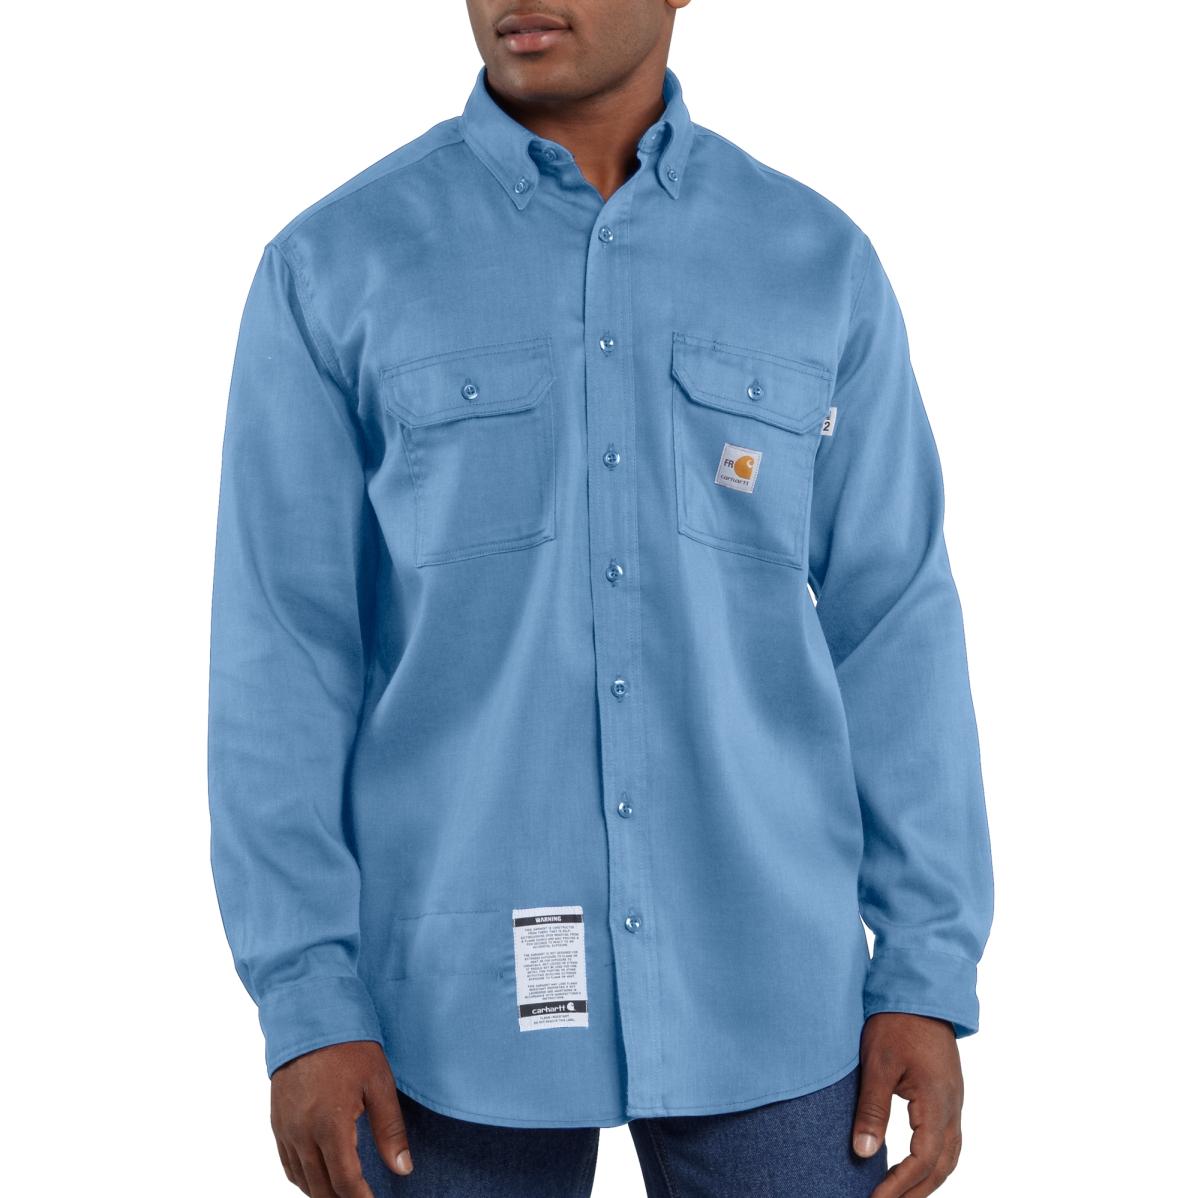 Carhartt - Mens Flame-Resistant LW Twill Shirt-Carhartt